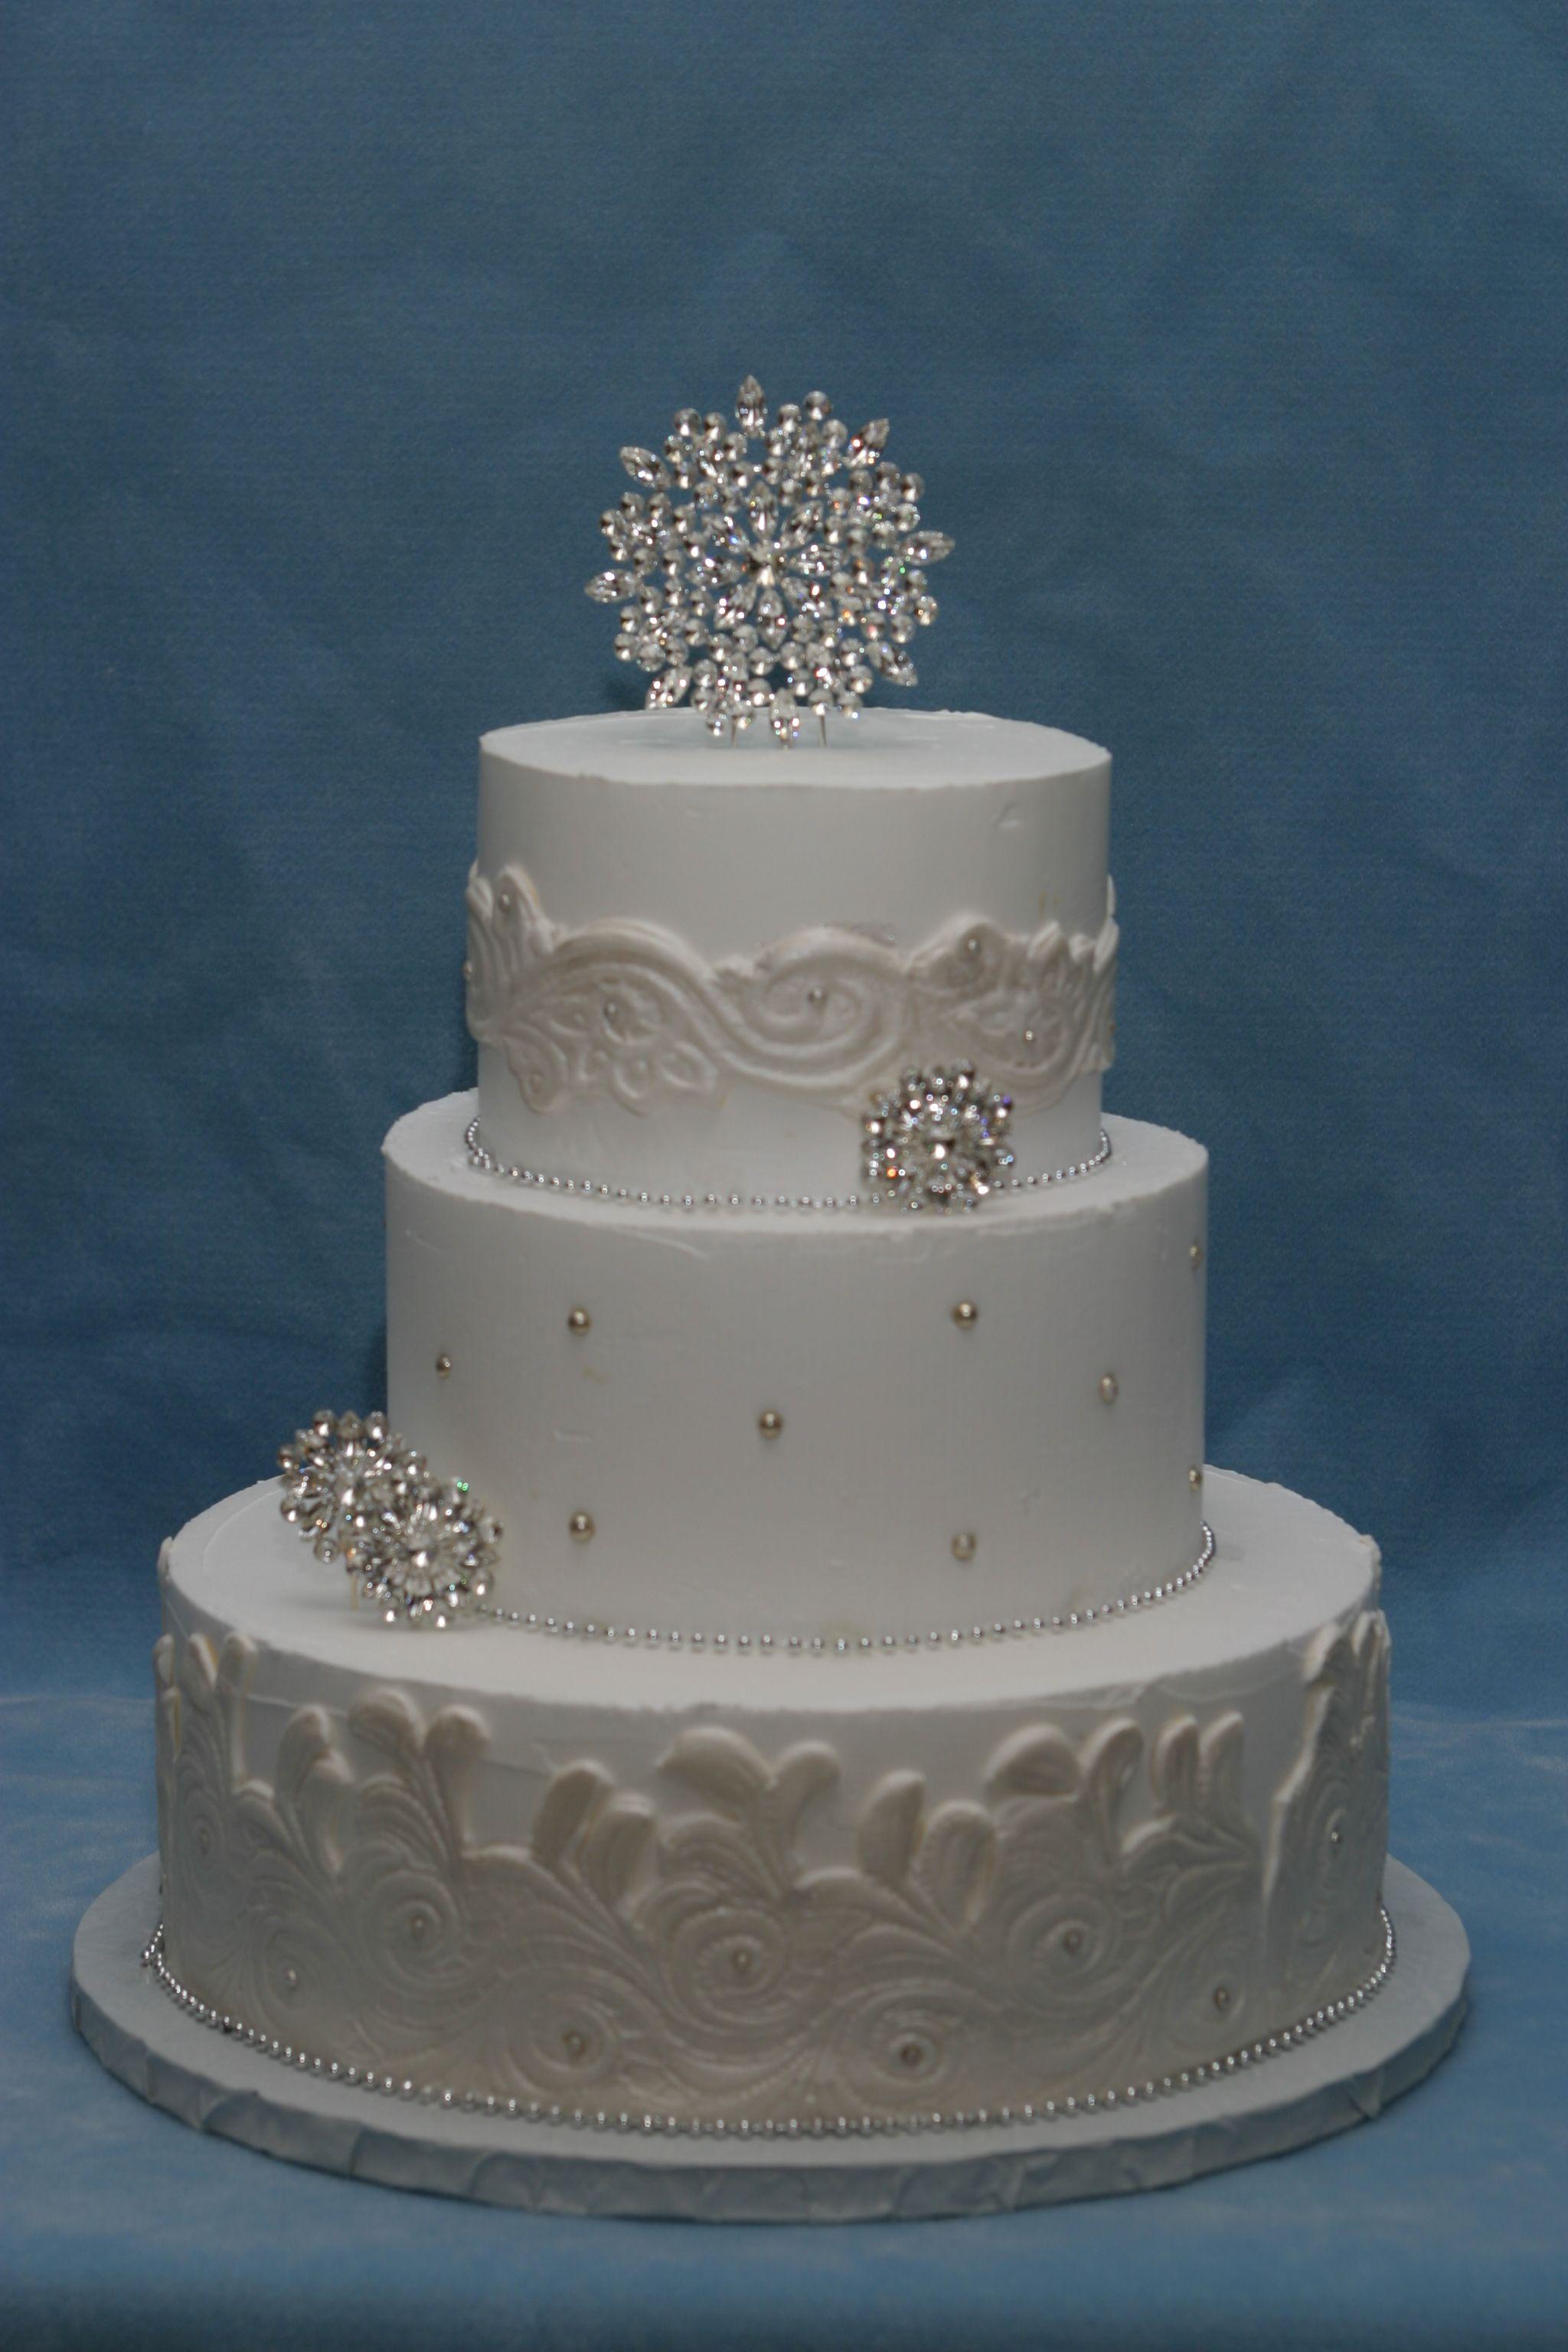 Winter Wedding Cake Do Without Fondant Use Buttercream Or